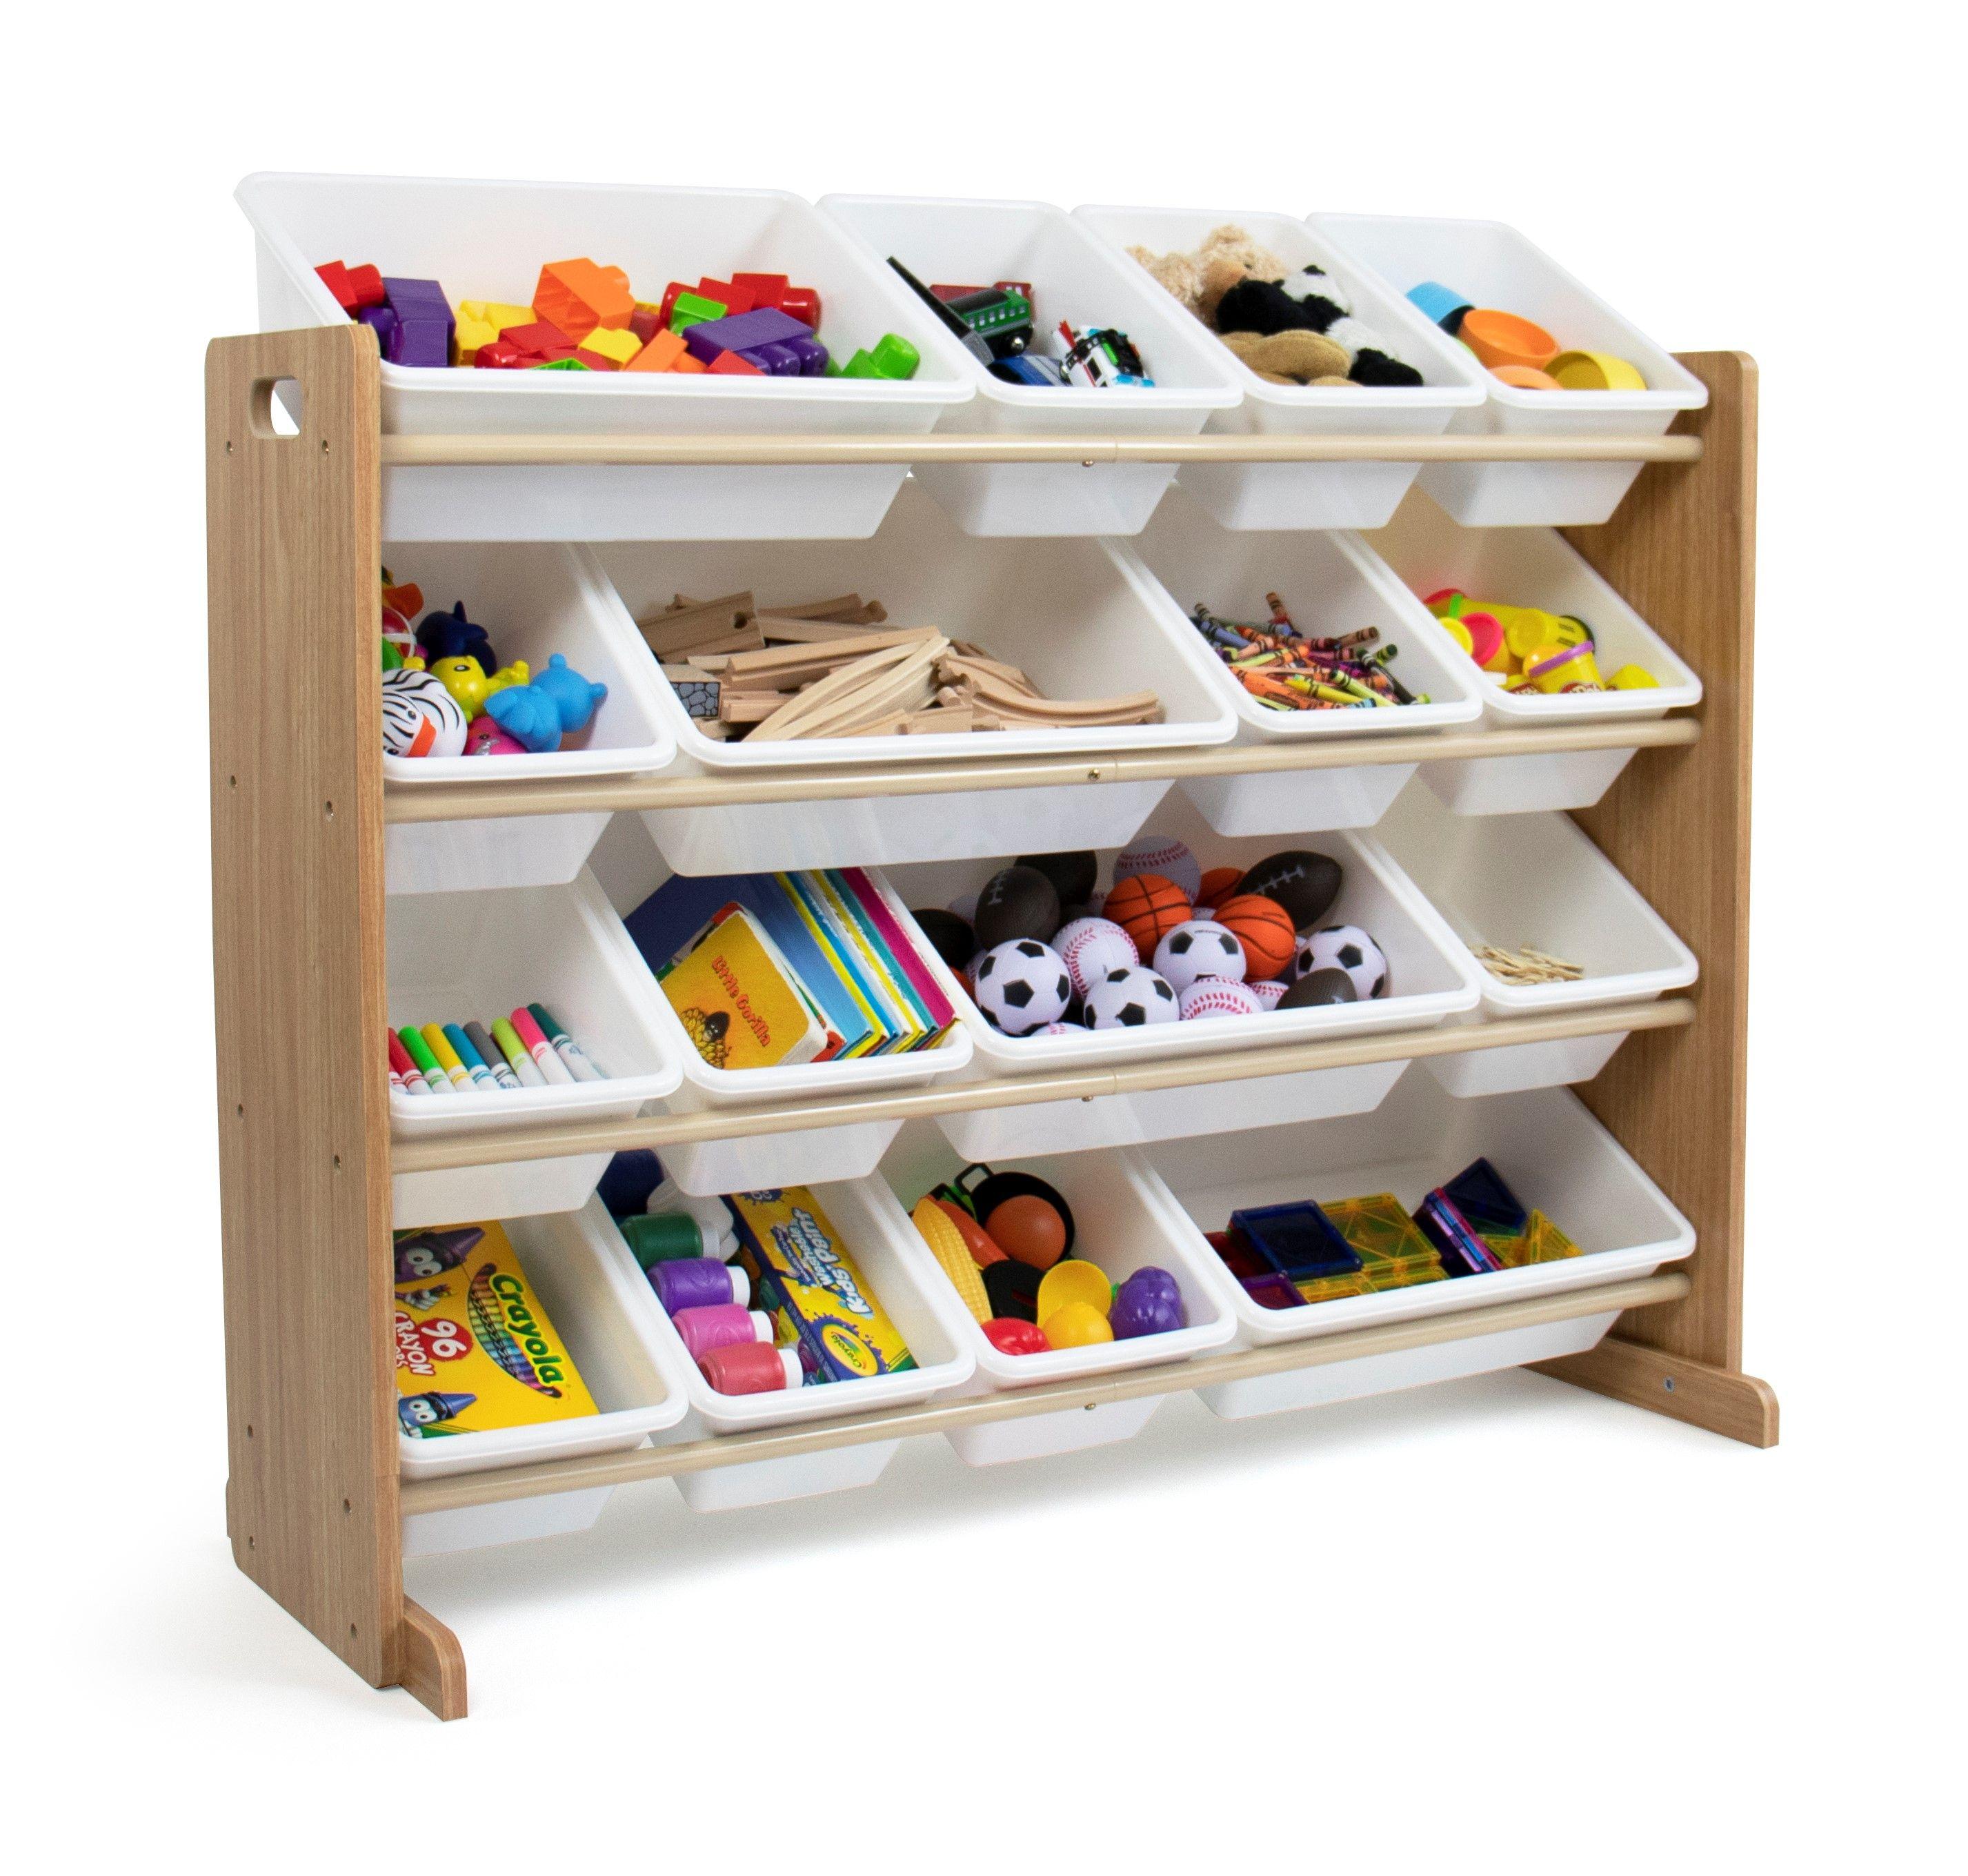 Kids Toy Storage Google Search Kid Toy Storage Toy Storage